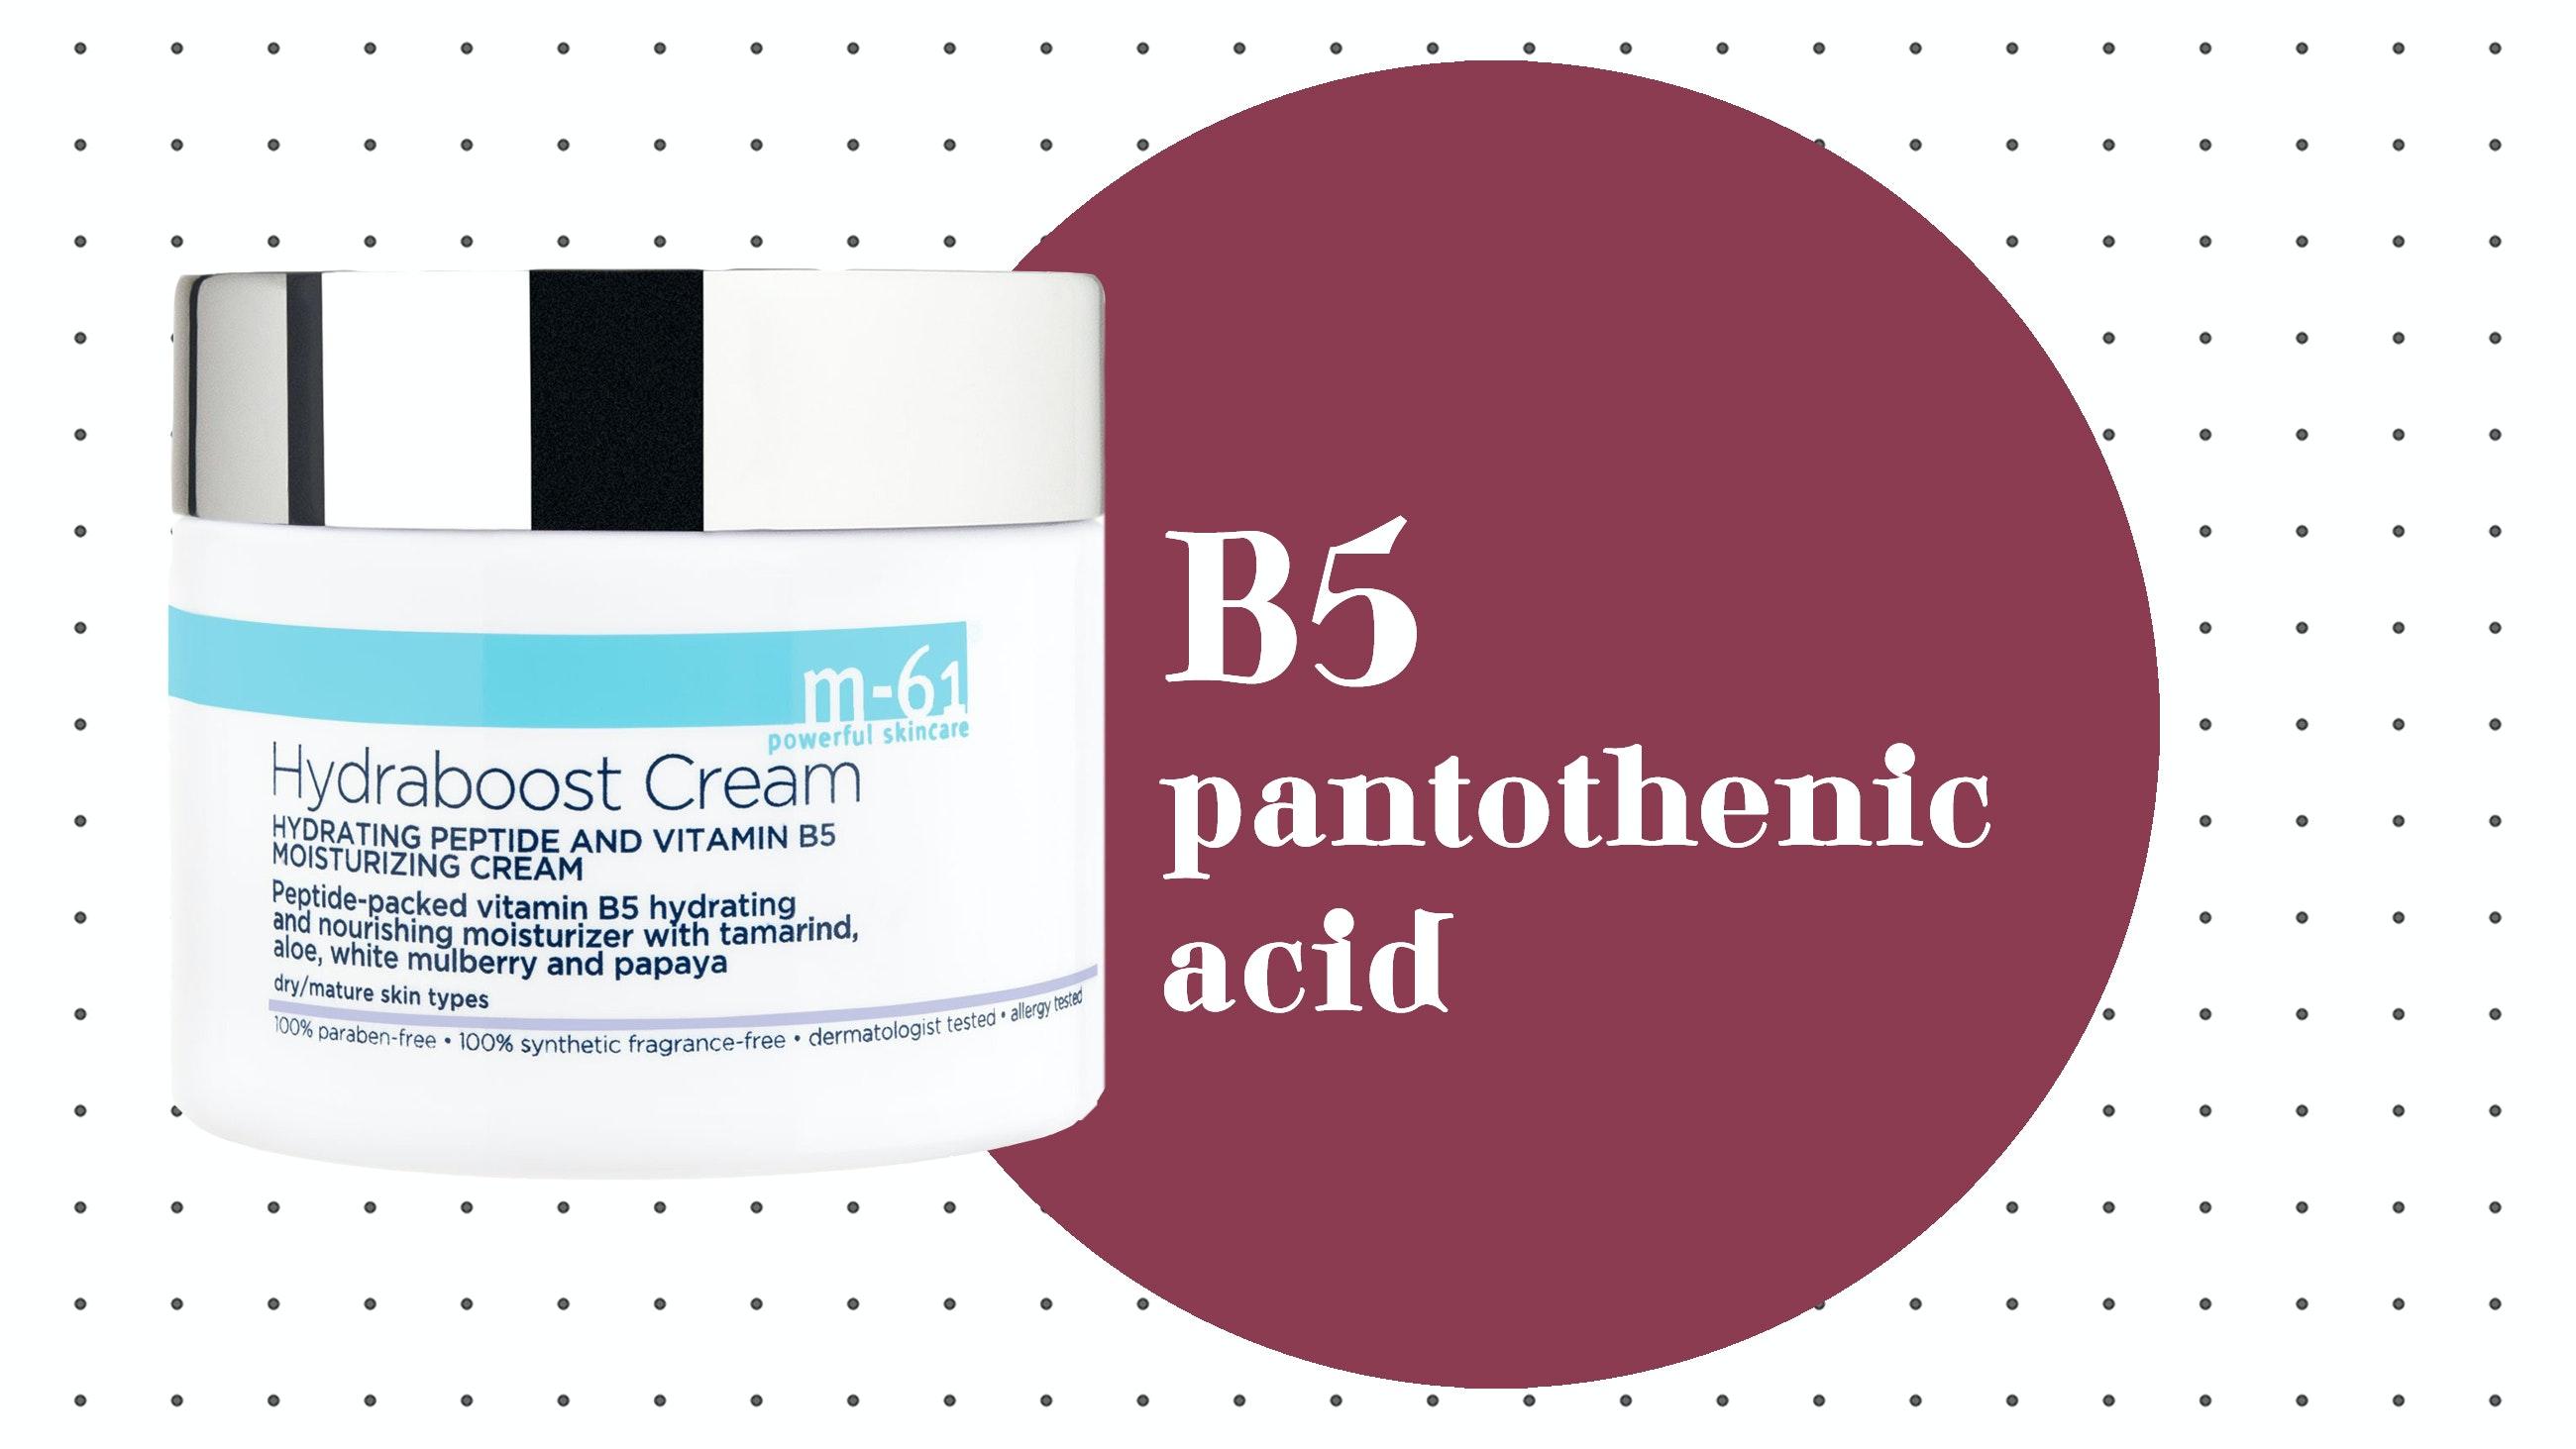 M-61 Hydraboost Cream